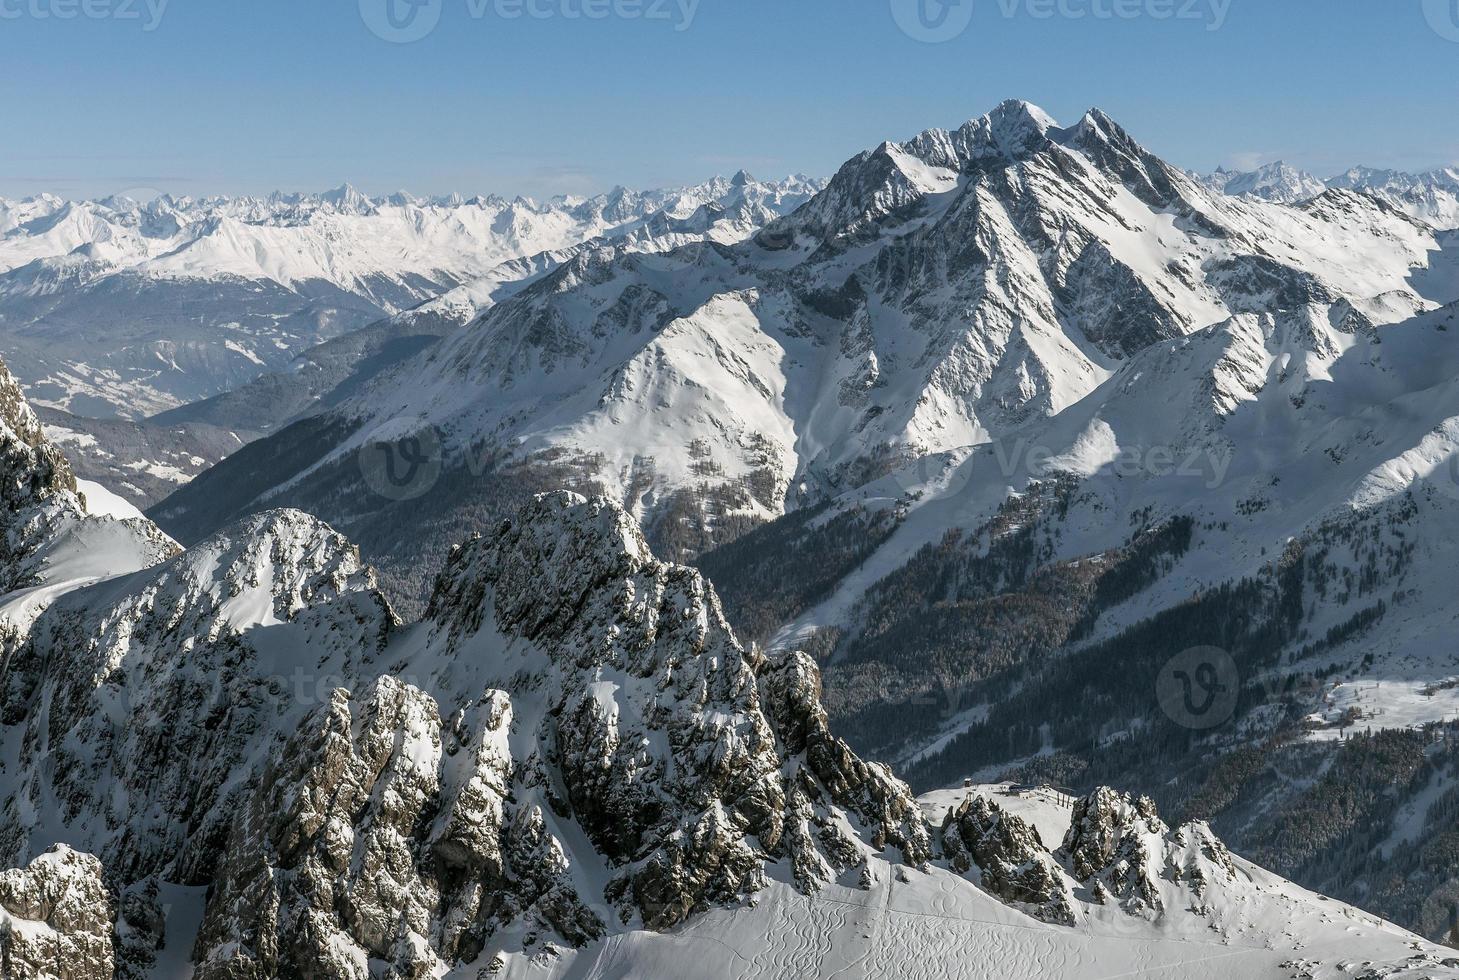 The Alps in St. Anton (Austria) photo